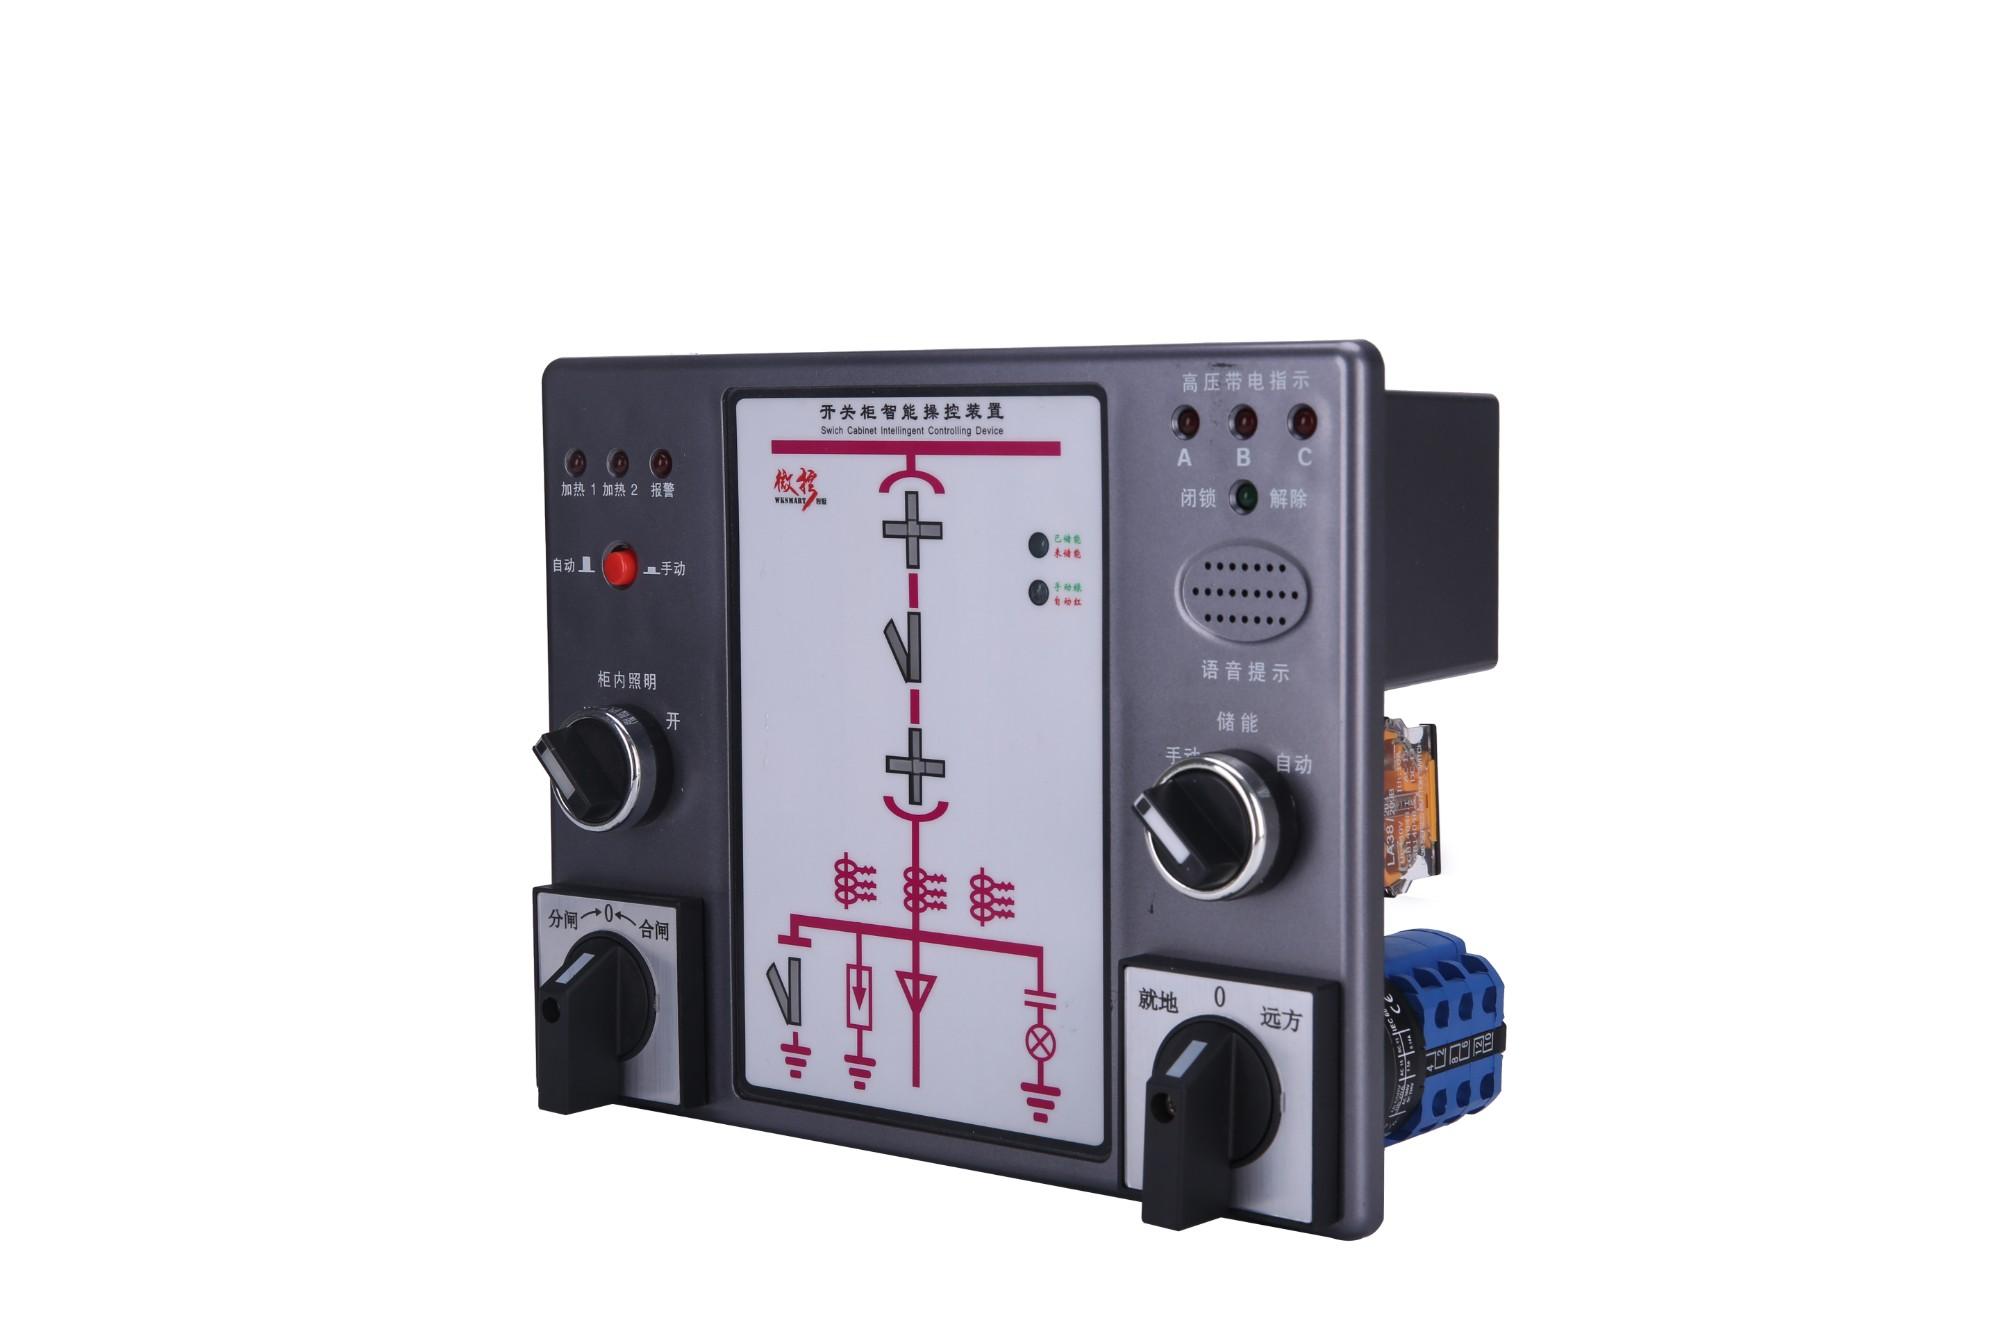 MS.CK-100系列按键型智能操控装置